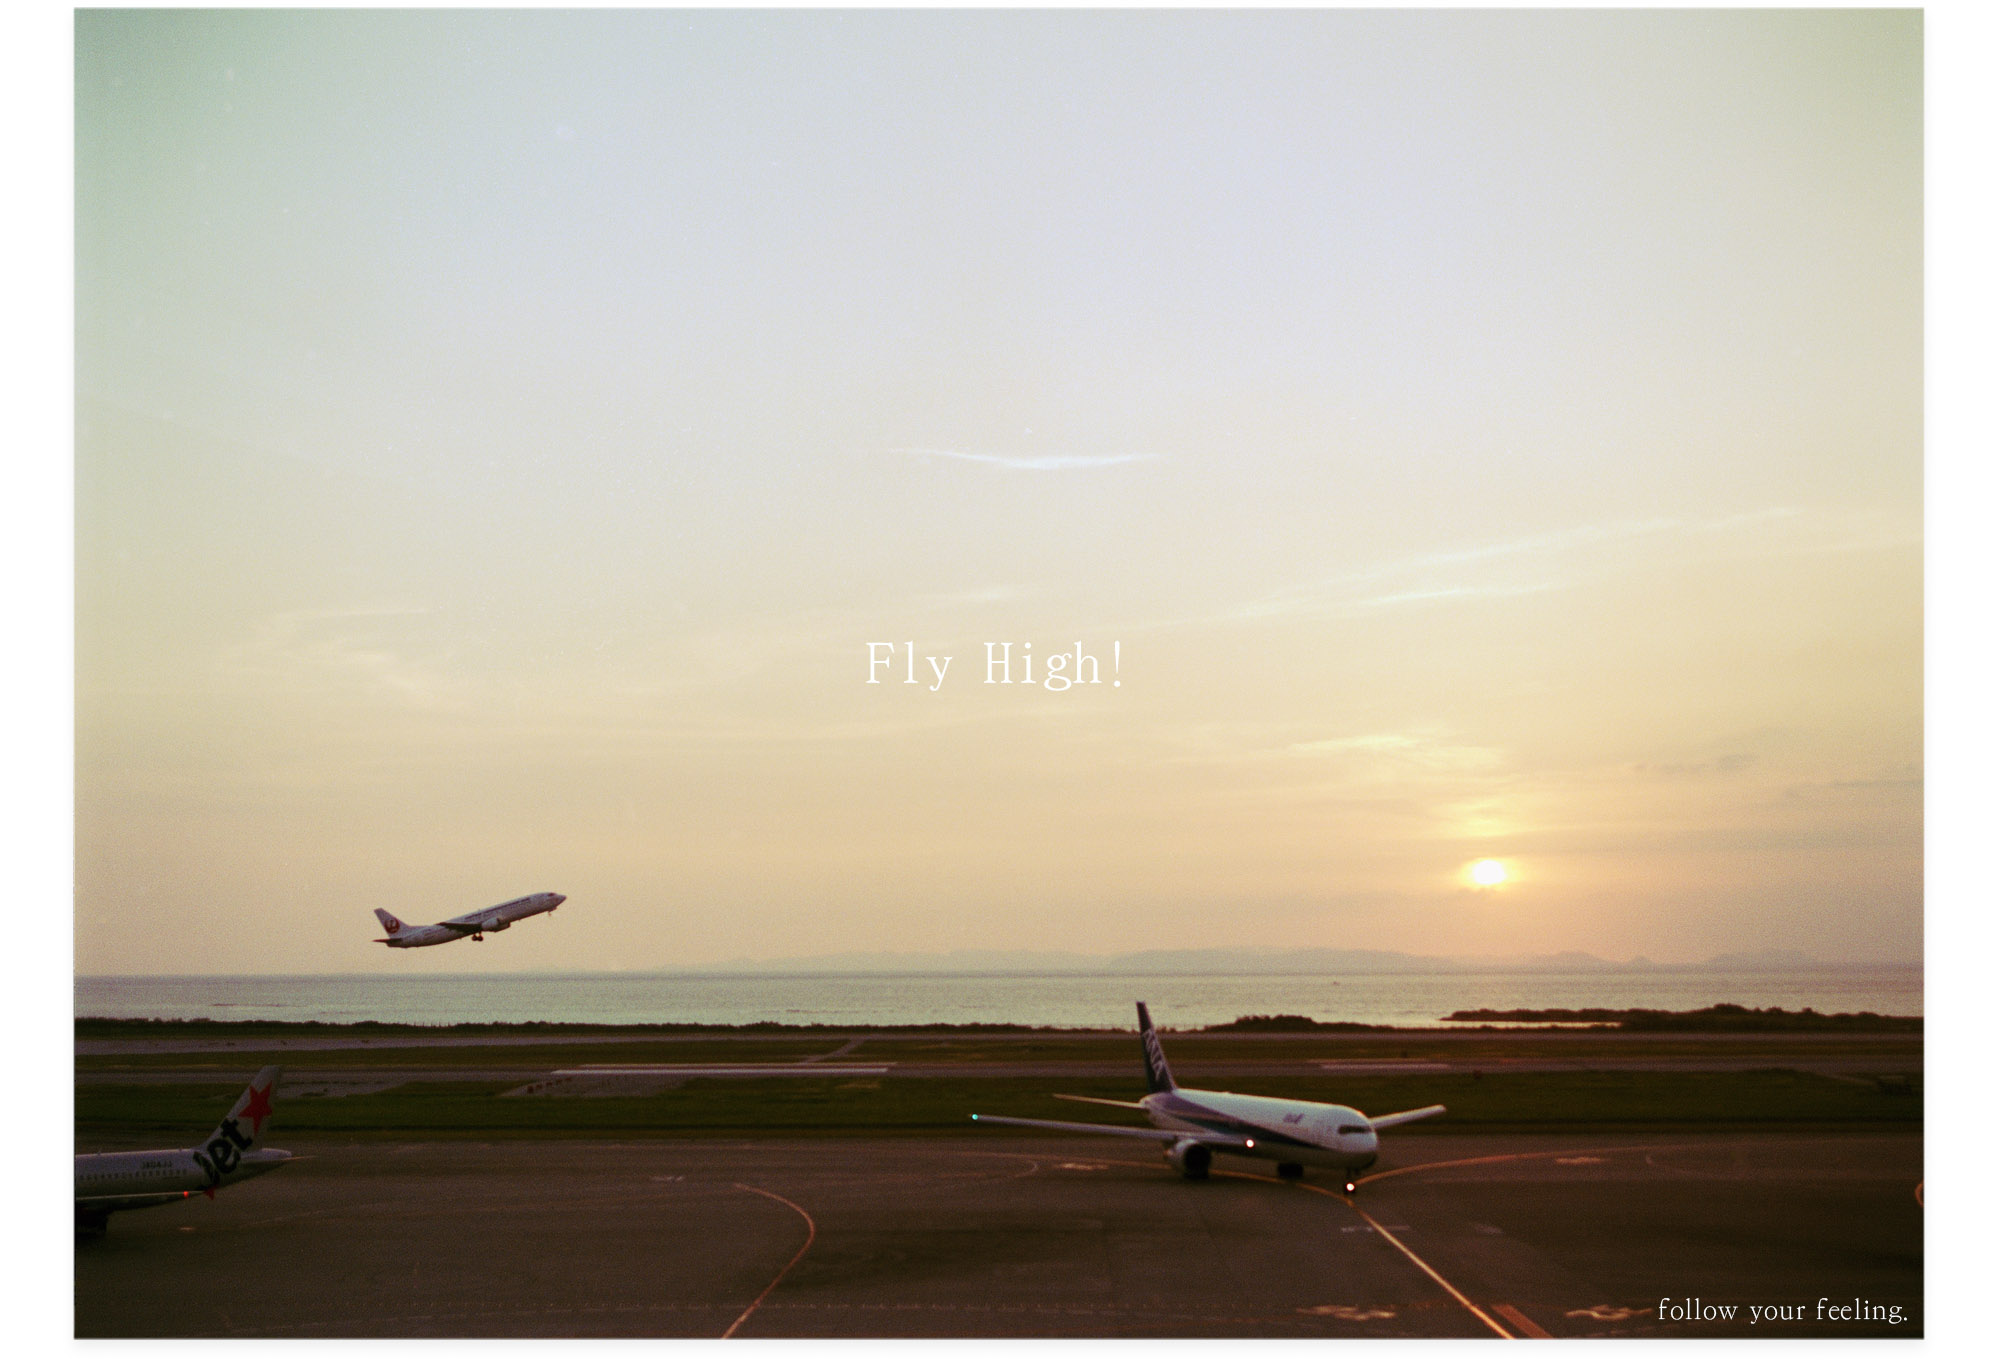 201301106_FlyHigh